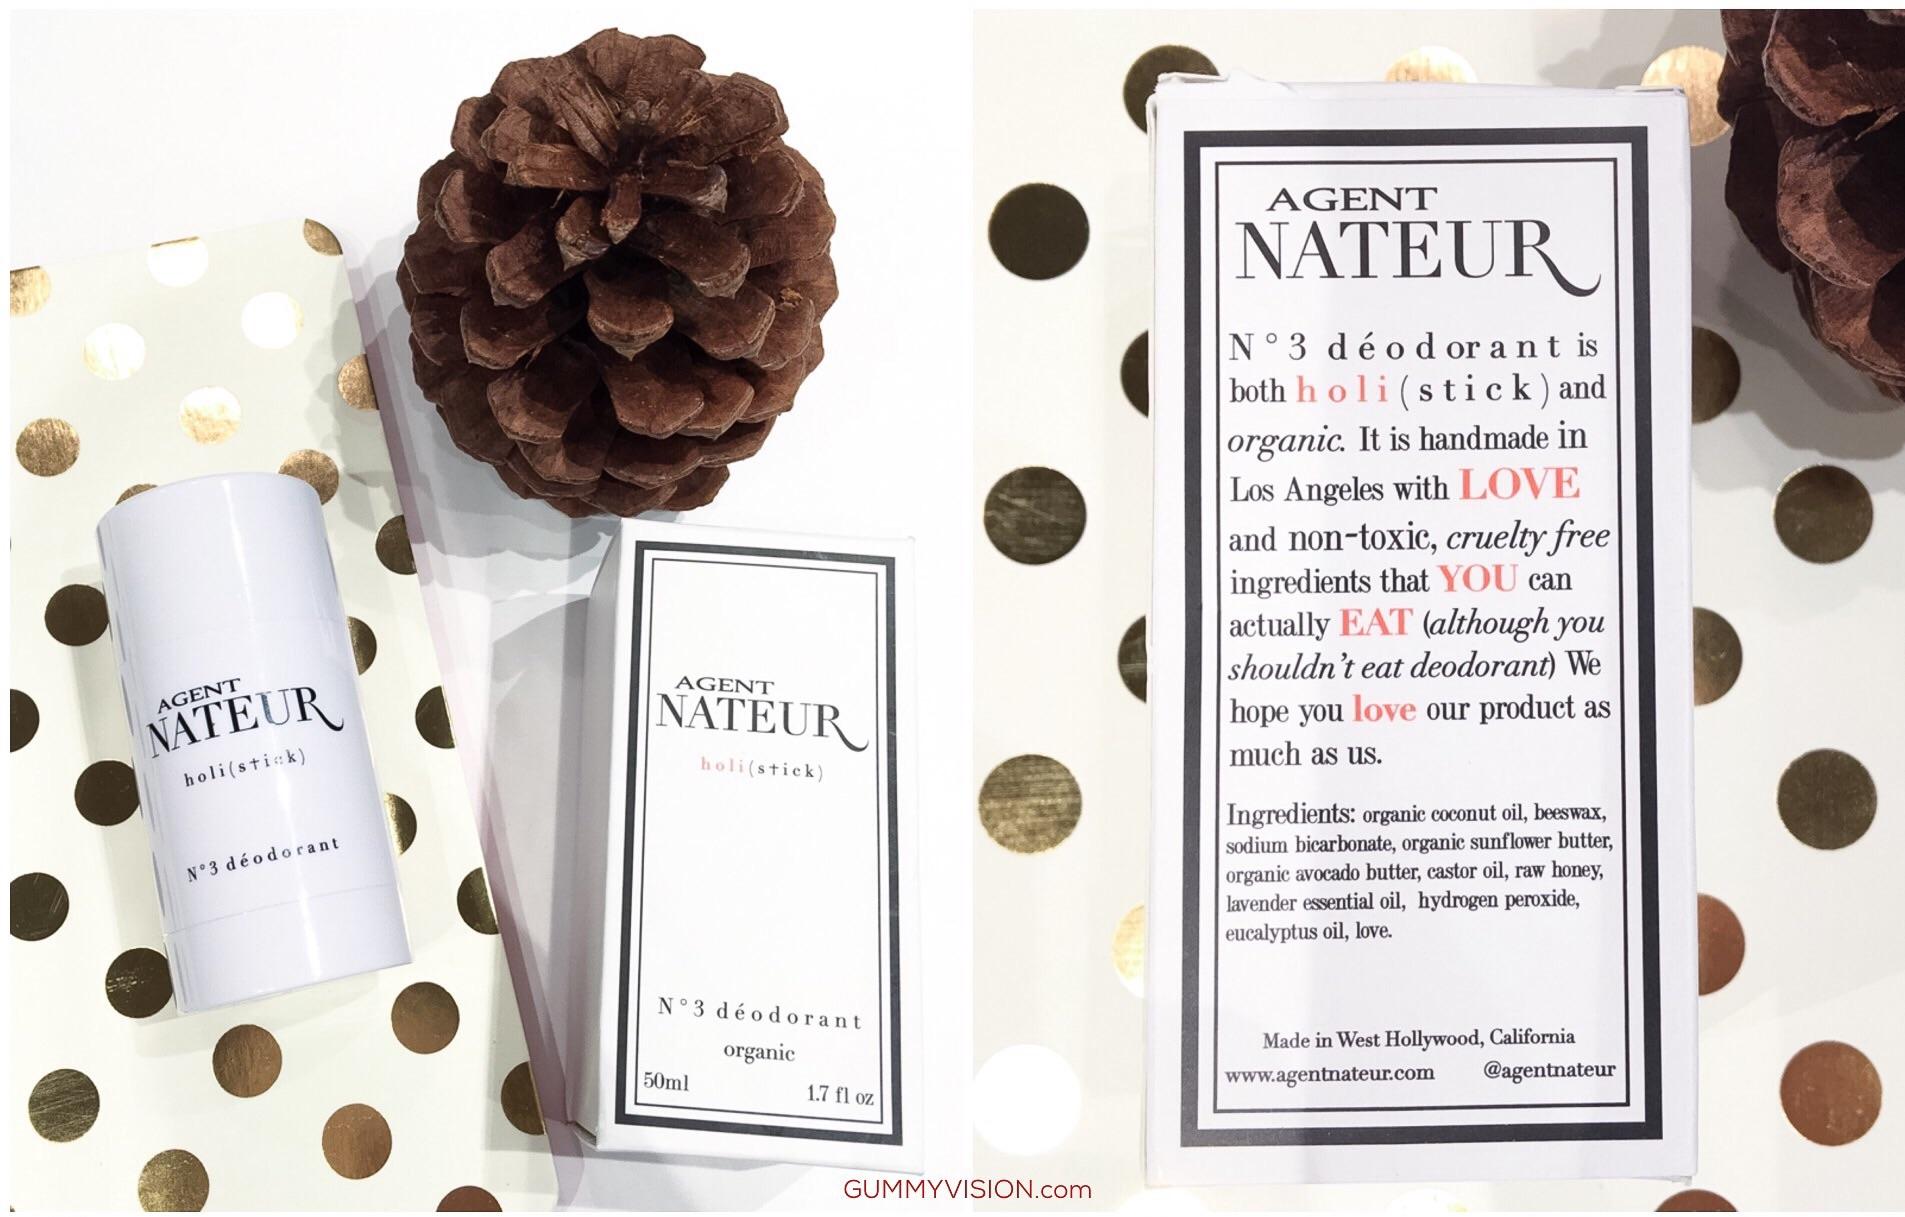 Click image to enlarge & read the ingredient list . Agent Nateur N°3 Deodorant - gummyvision.com